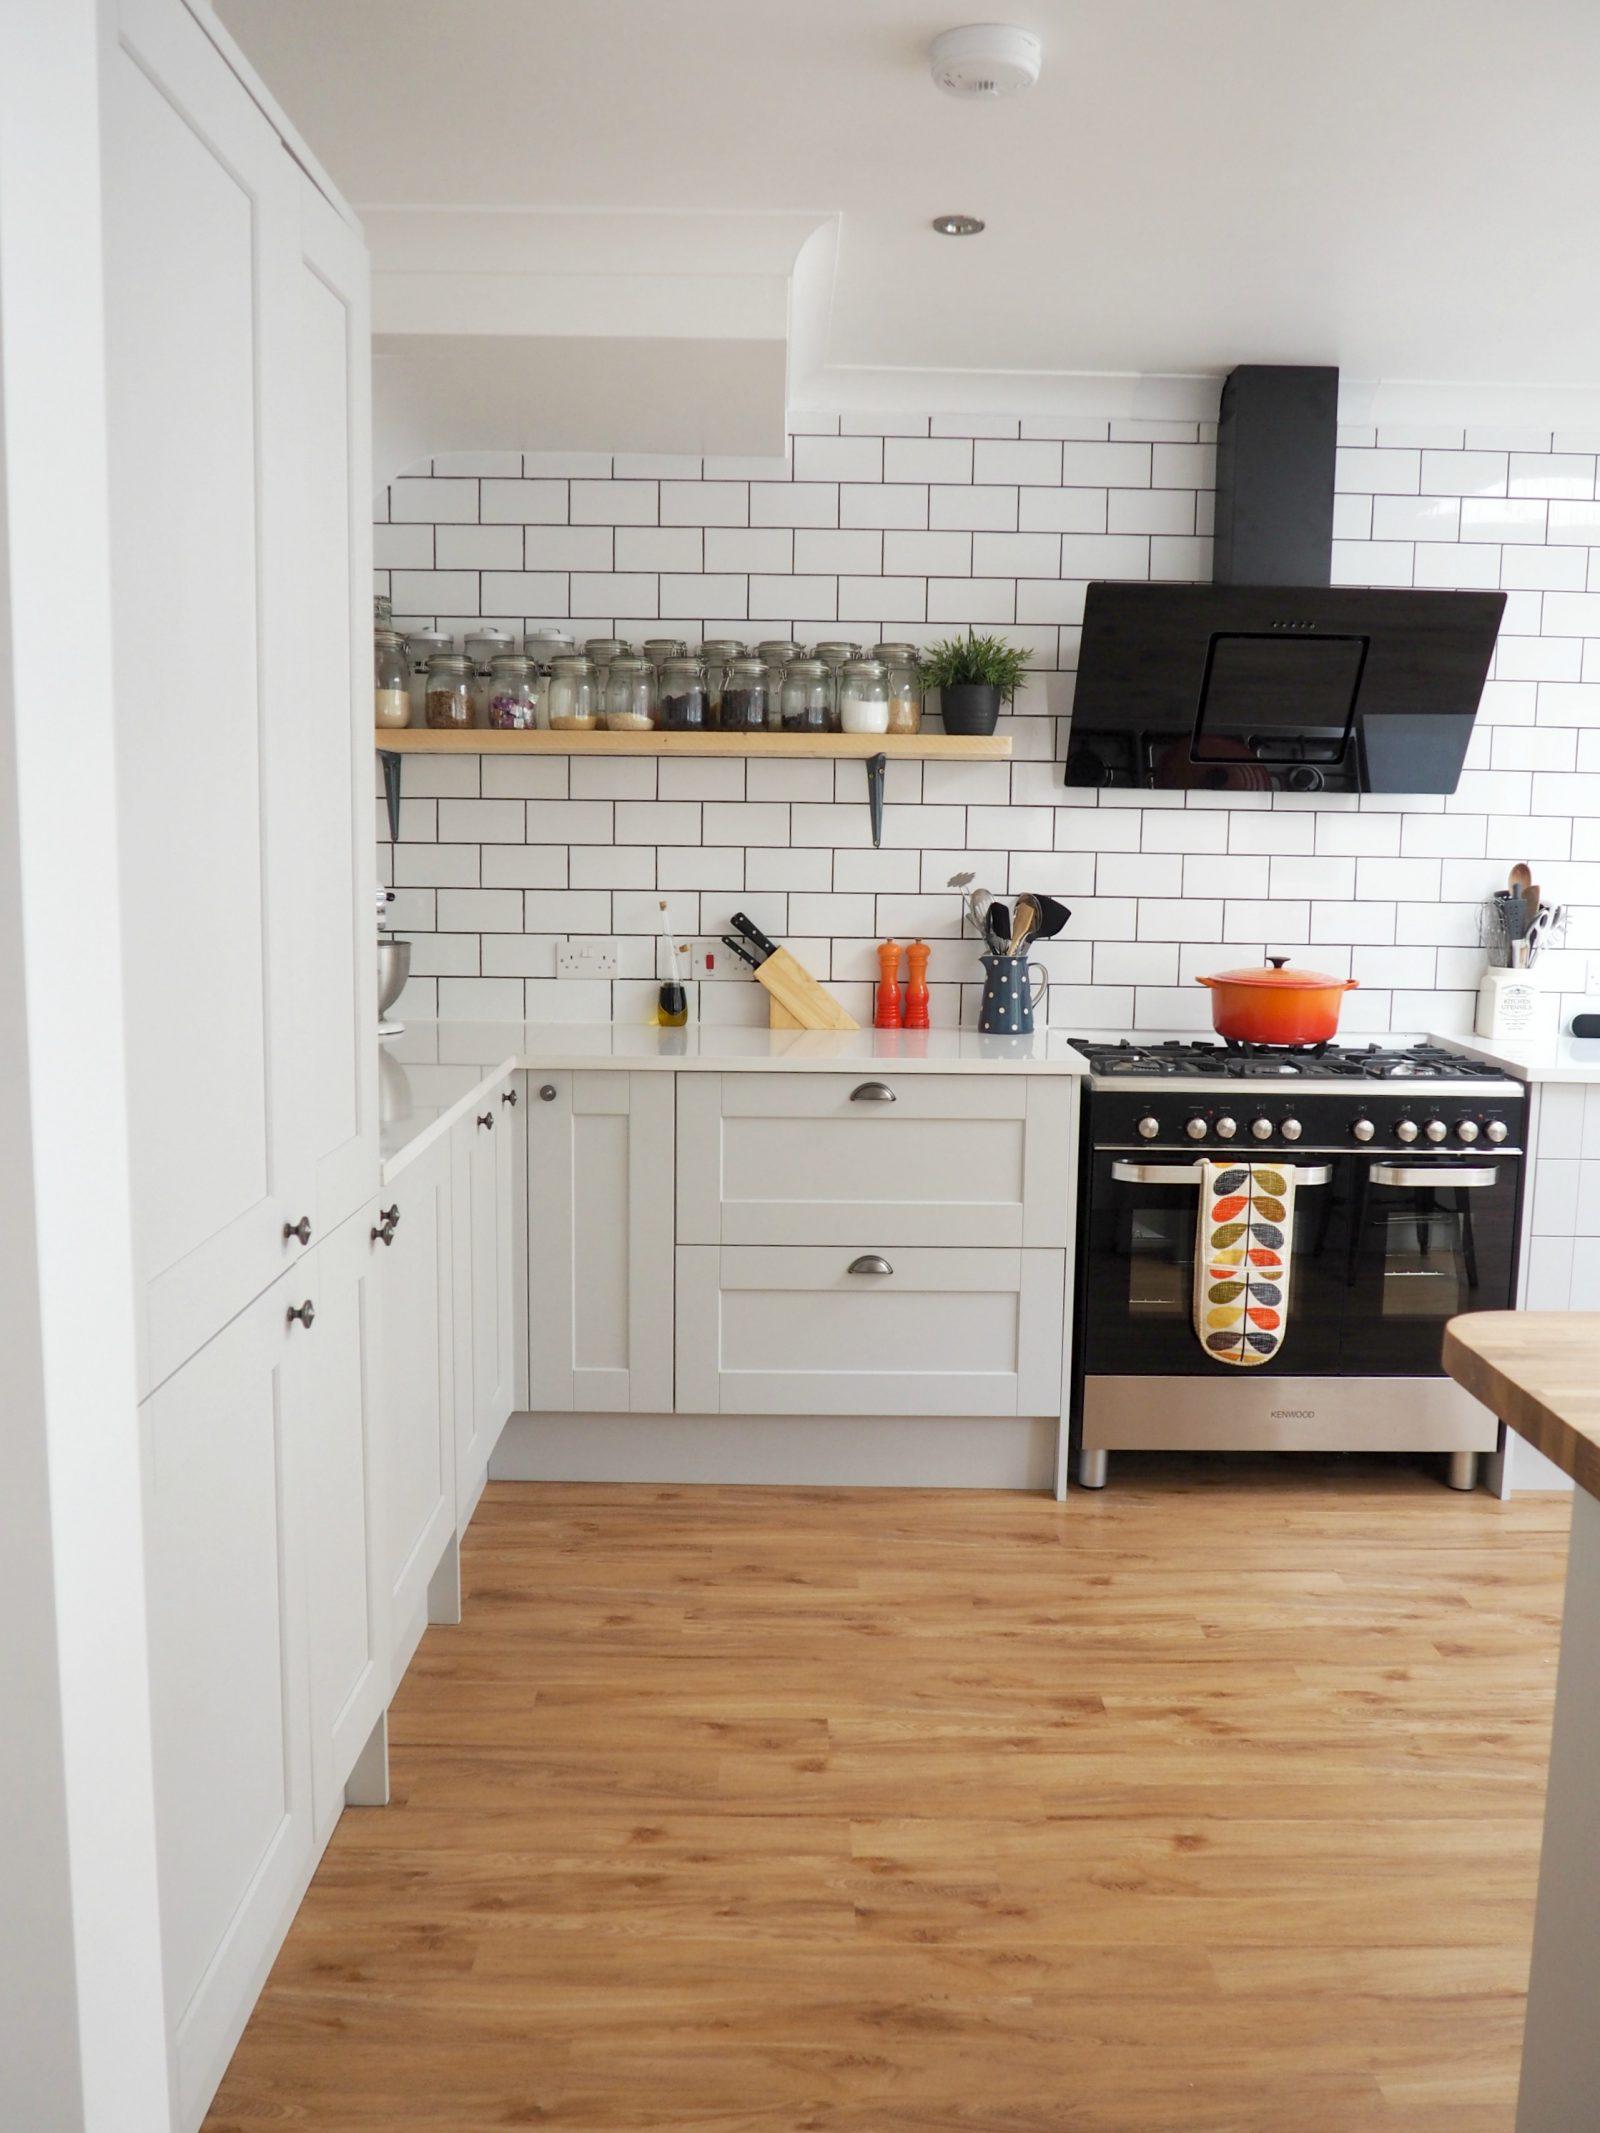 Choosing our kitchen floor